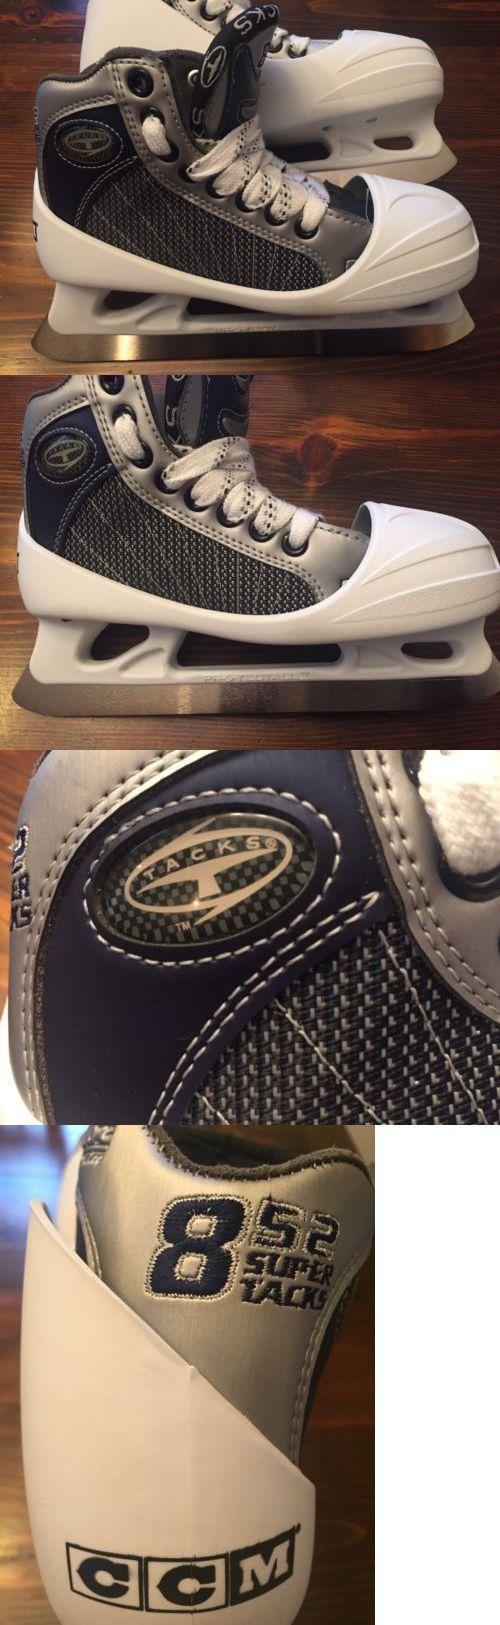 Ice Hockey-Youth 26342: Ccm 852 Youth Ice Hockey Goalie Skates 13.5 E -> BUY IT NOW ONLY: $79.99 on eBay!